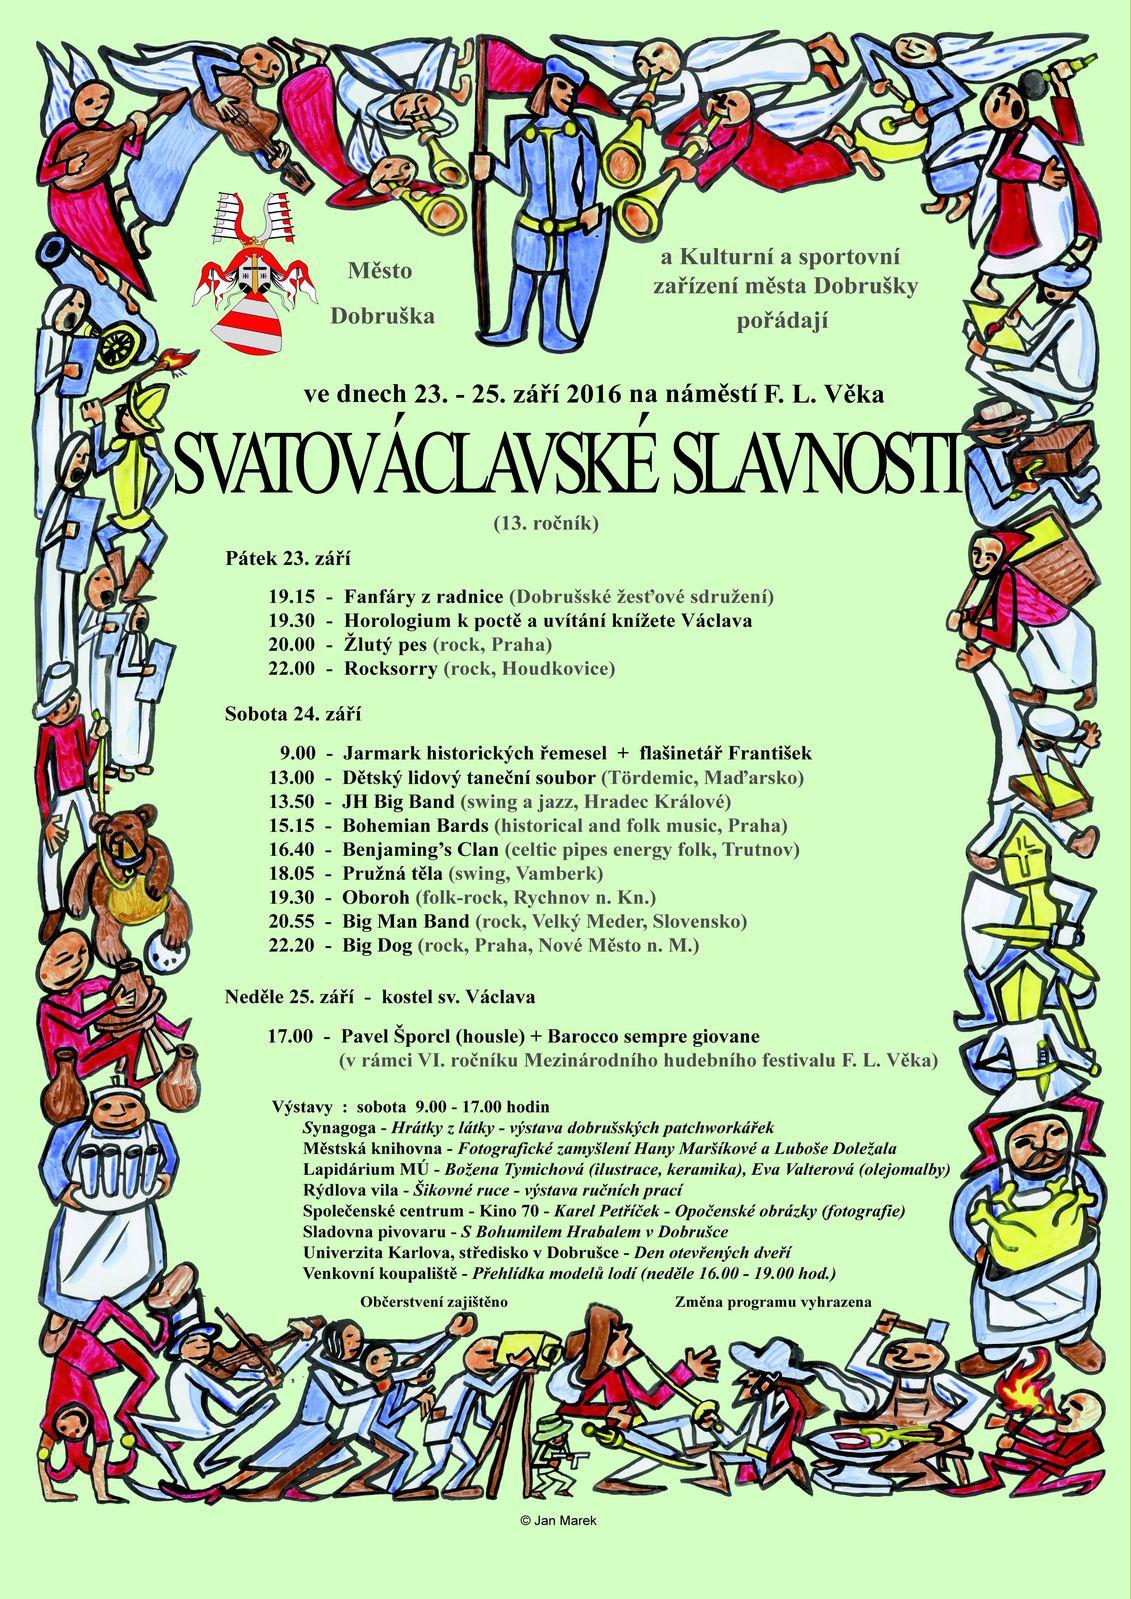 23-25-9-2016-svatovaclavky-dobruska